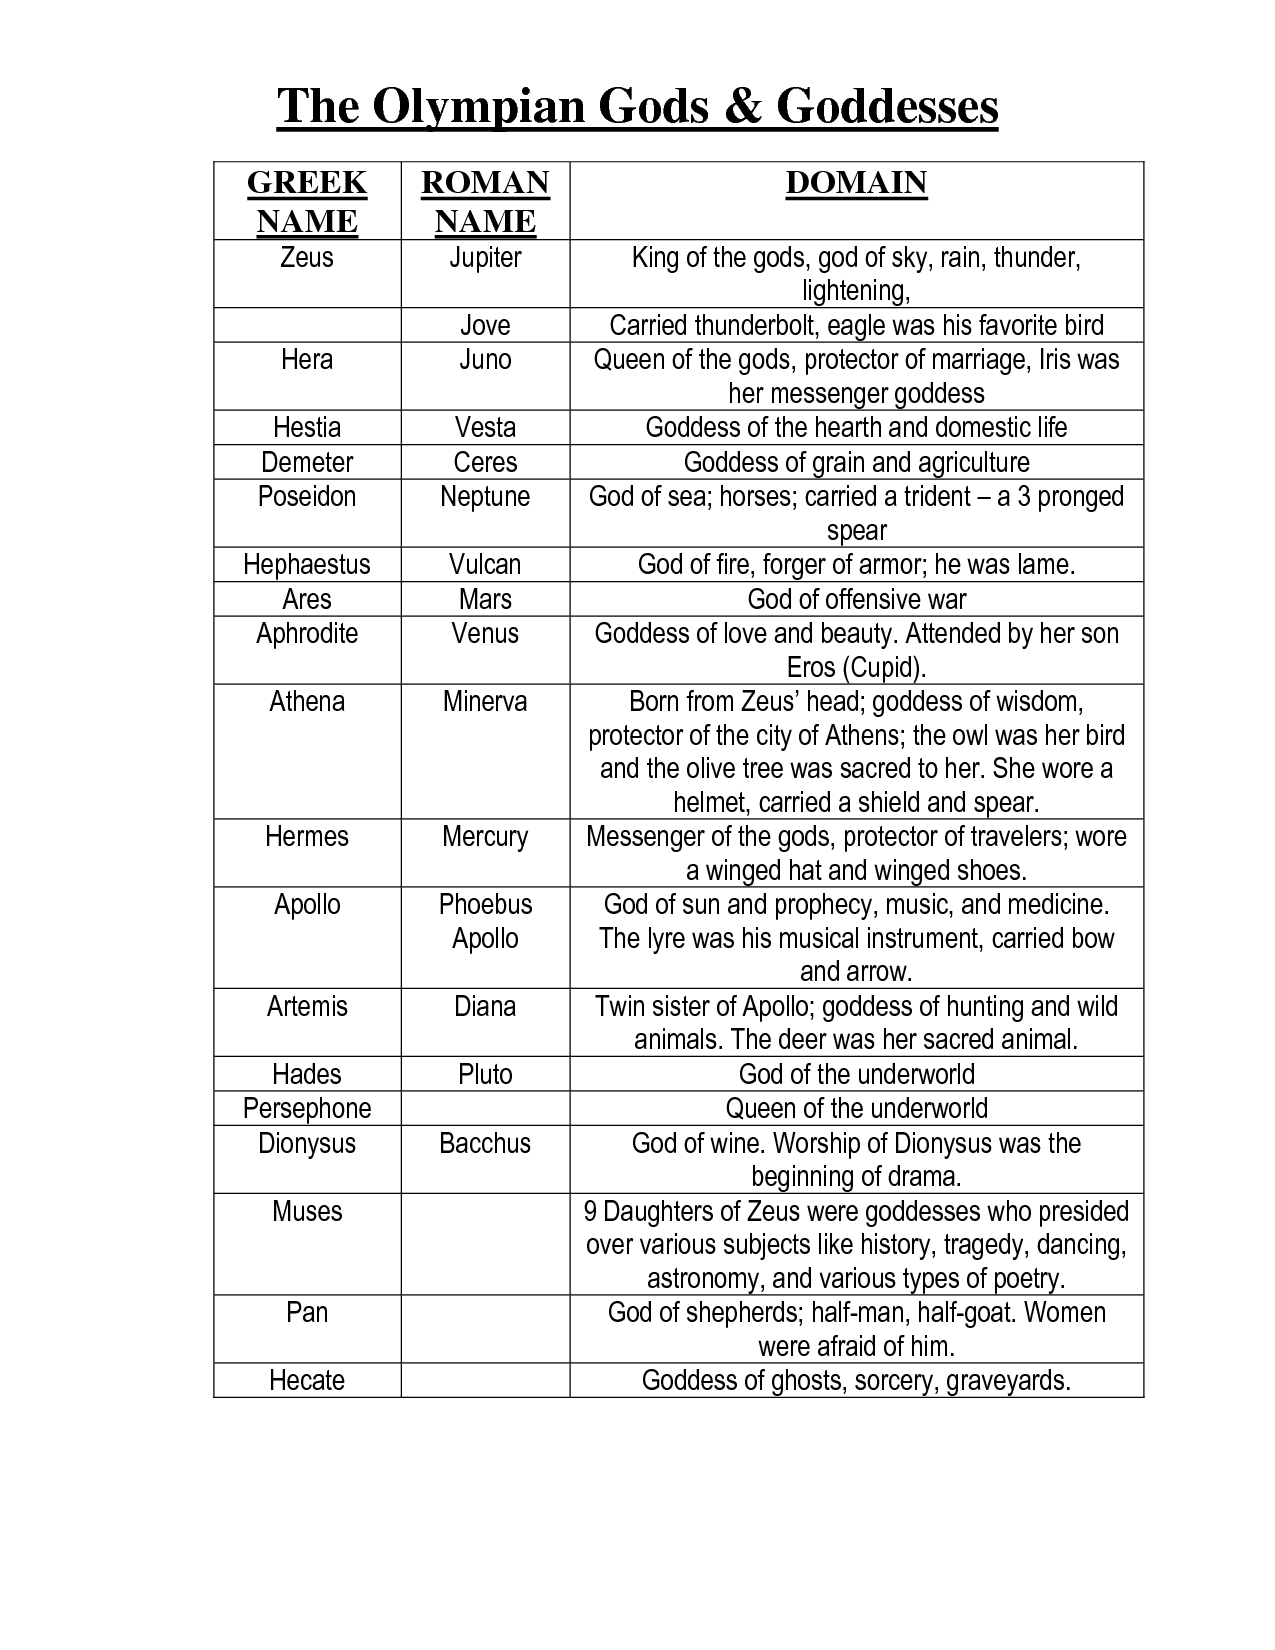 Greek Mythology Chart Of Gods And Goddesses